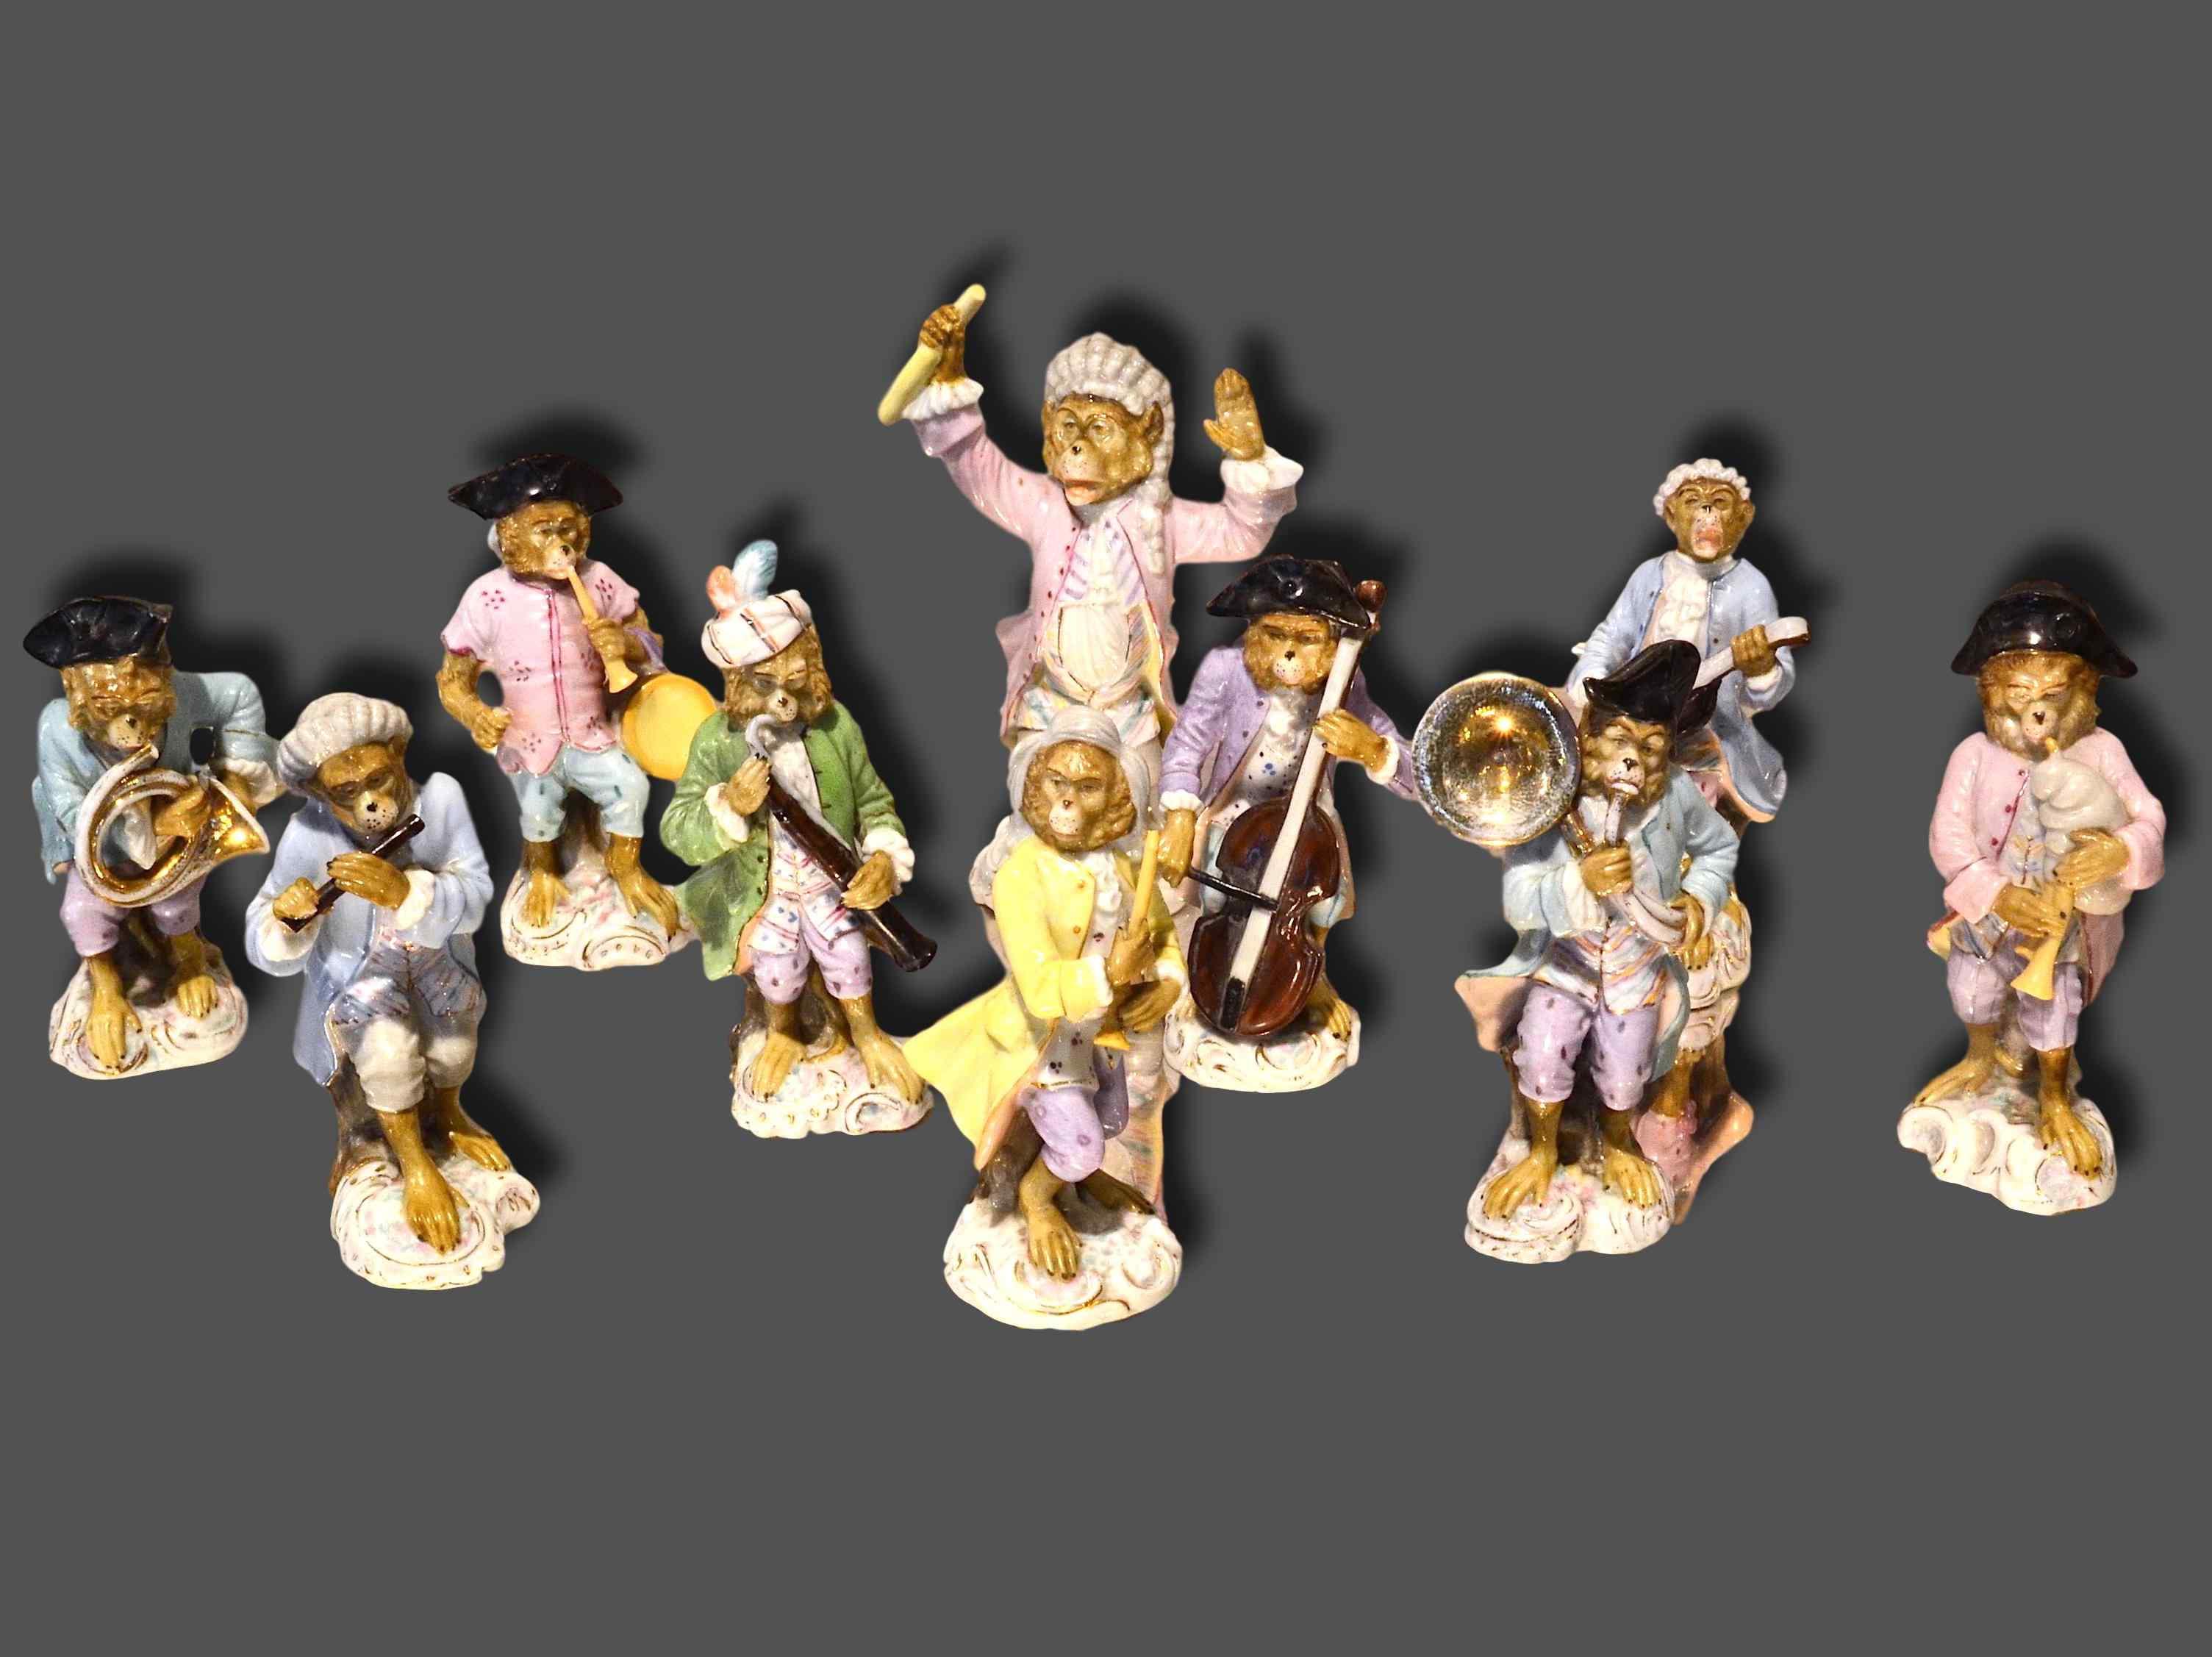 Porcelain monkey orchestra - Germany, end of '800